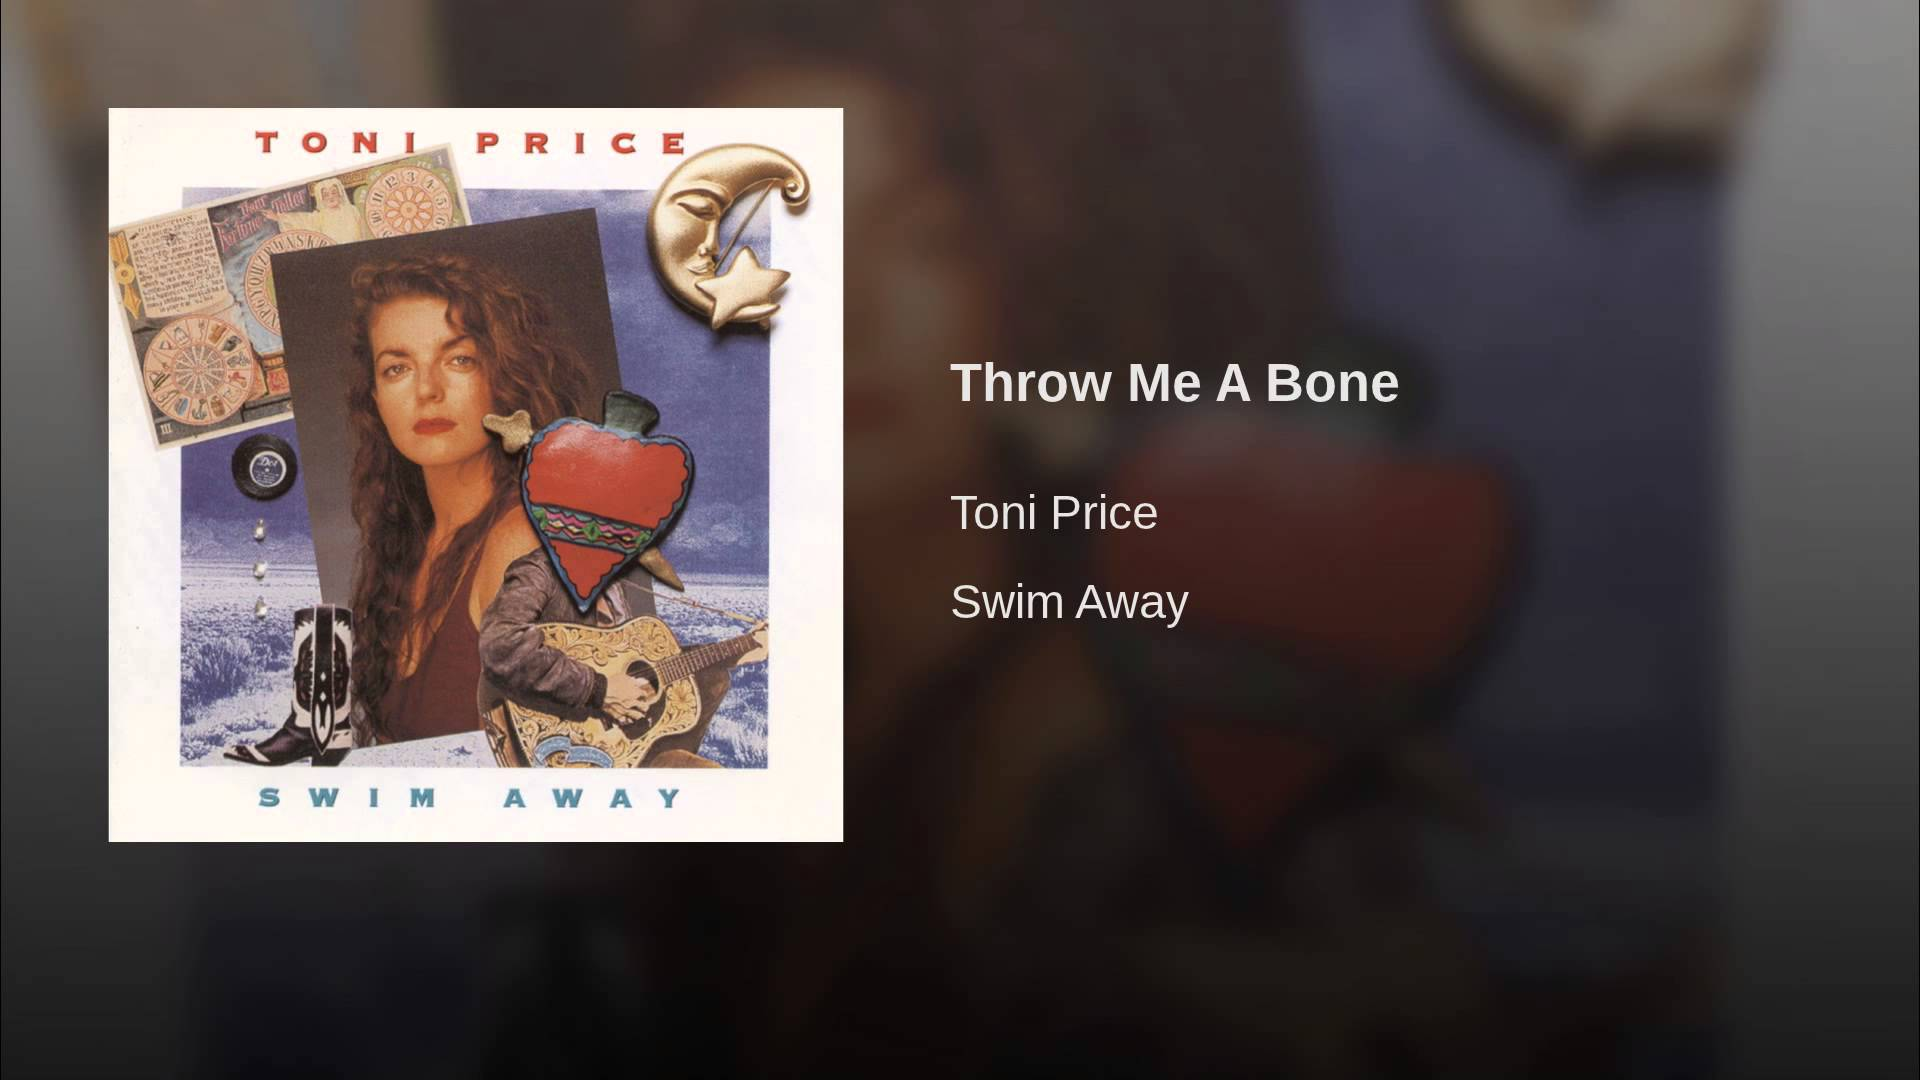 Toni Price: Throw Me A Bone